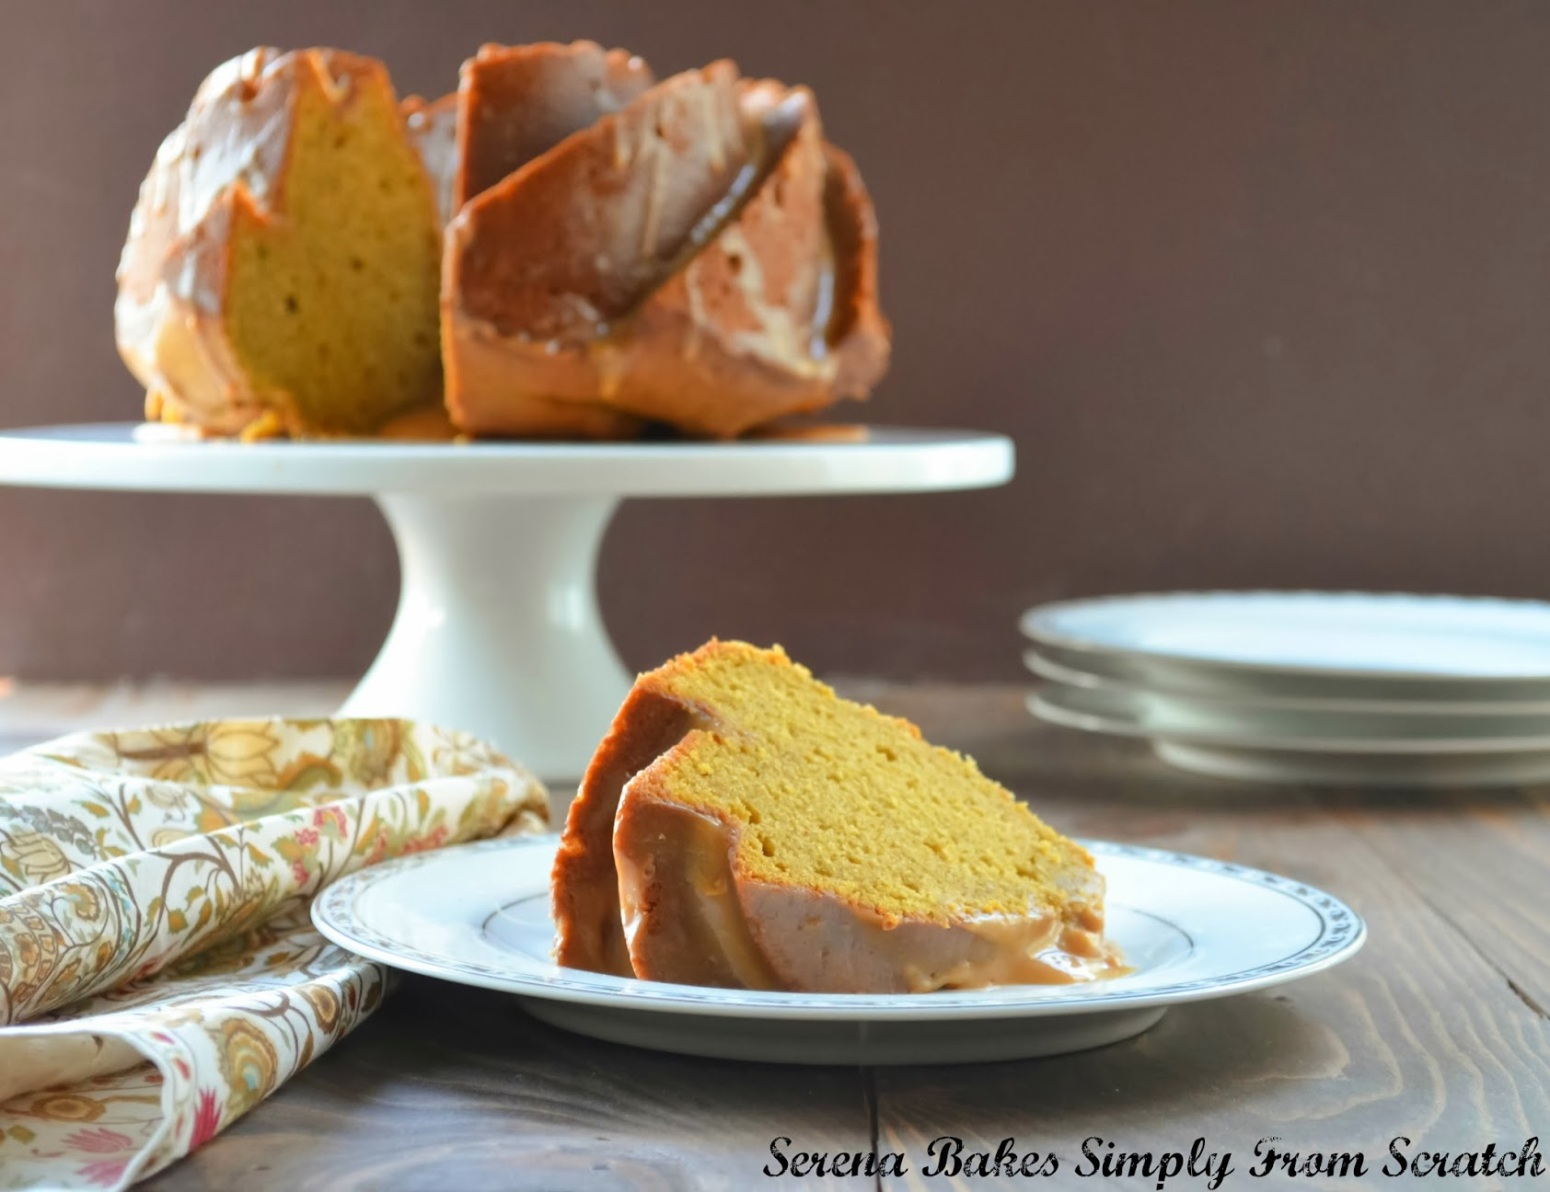 Pumpkin Spice Bundt Cake With Caramel Icing Recipe 2 | Just A Pinch ...